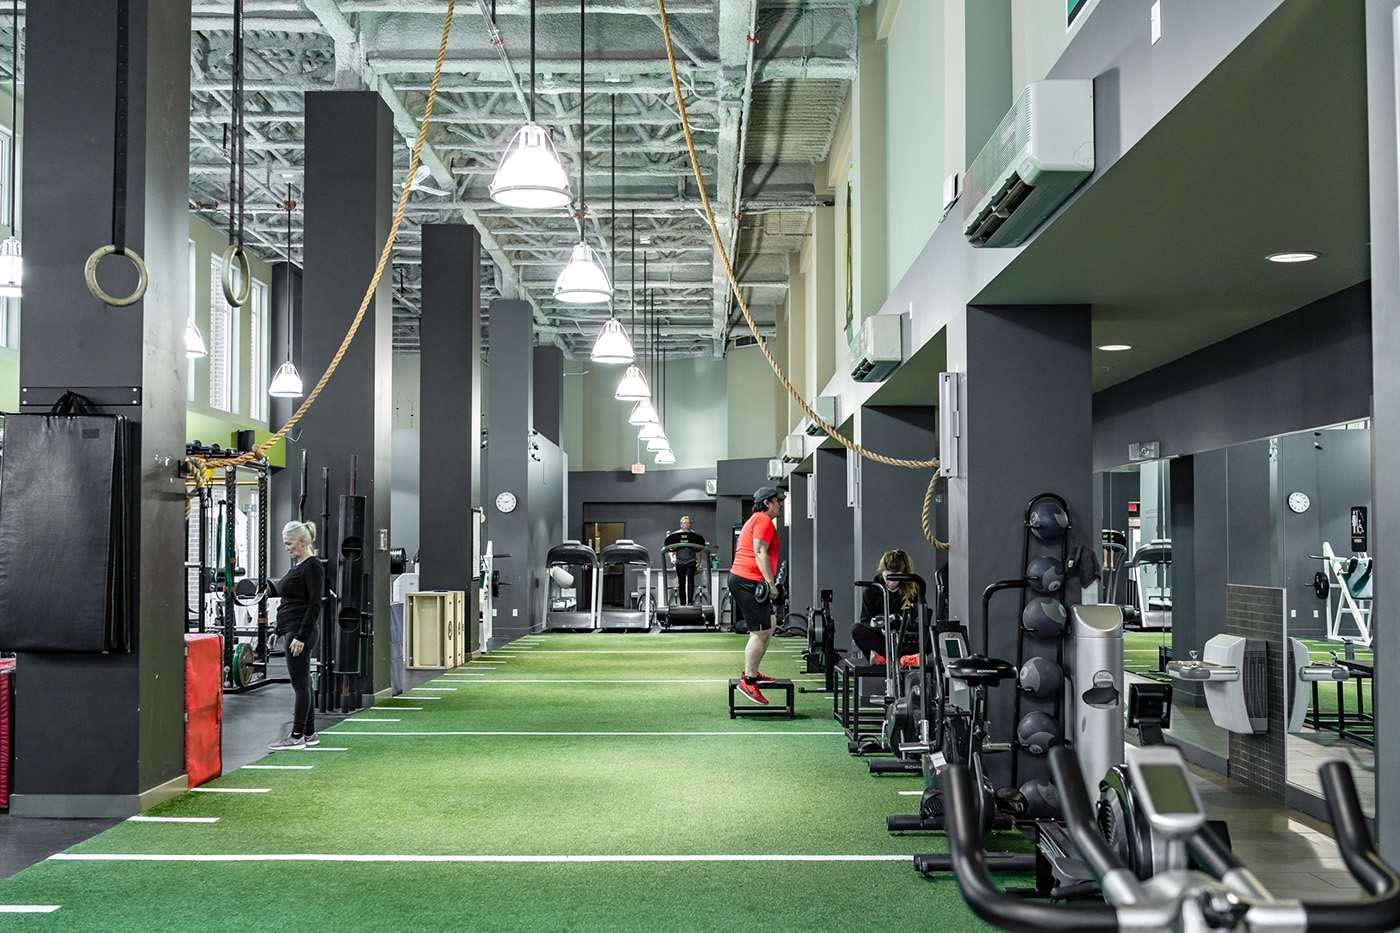 cityfit-gym-personal-training-calgary-workout-facility-inglewood-18.jpg